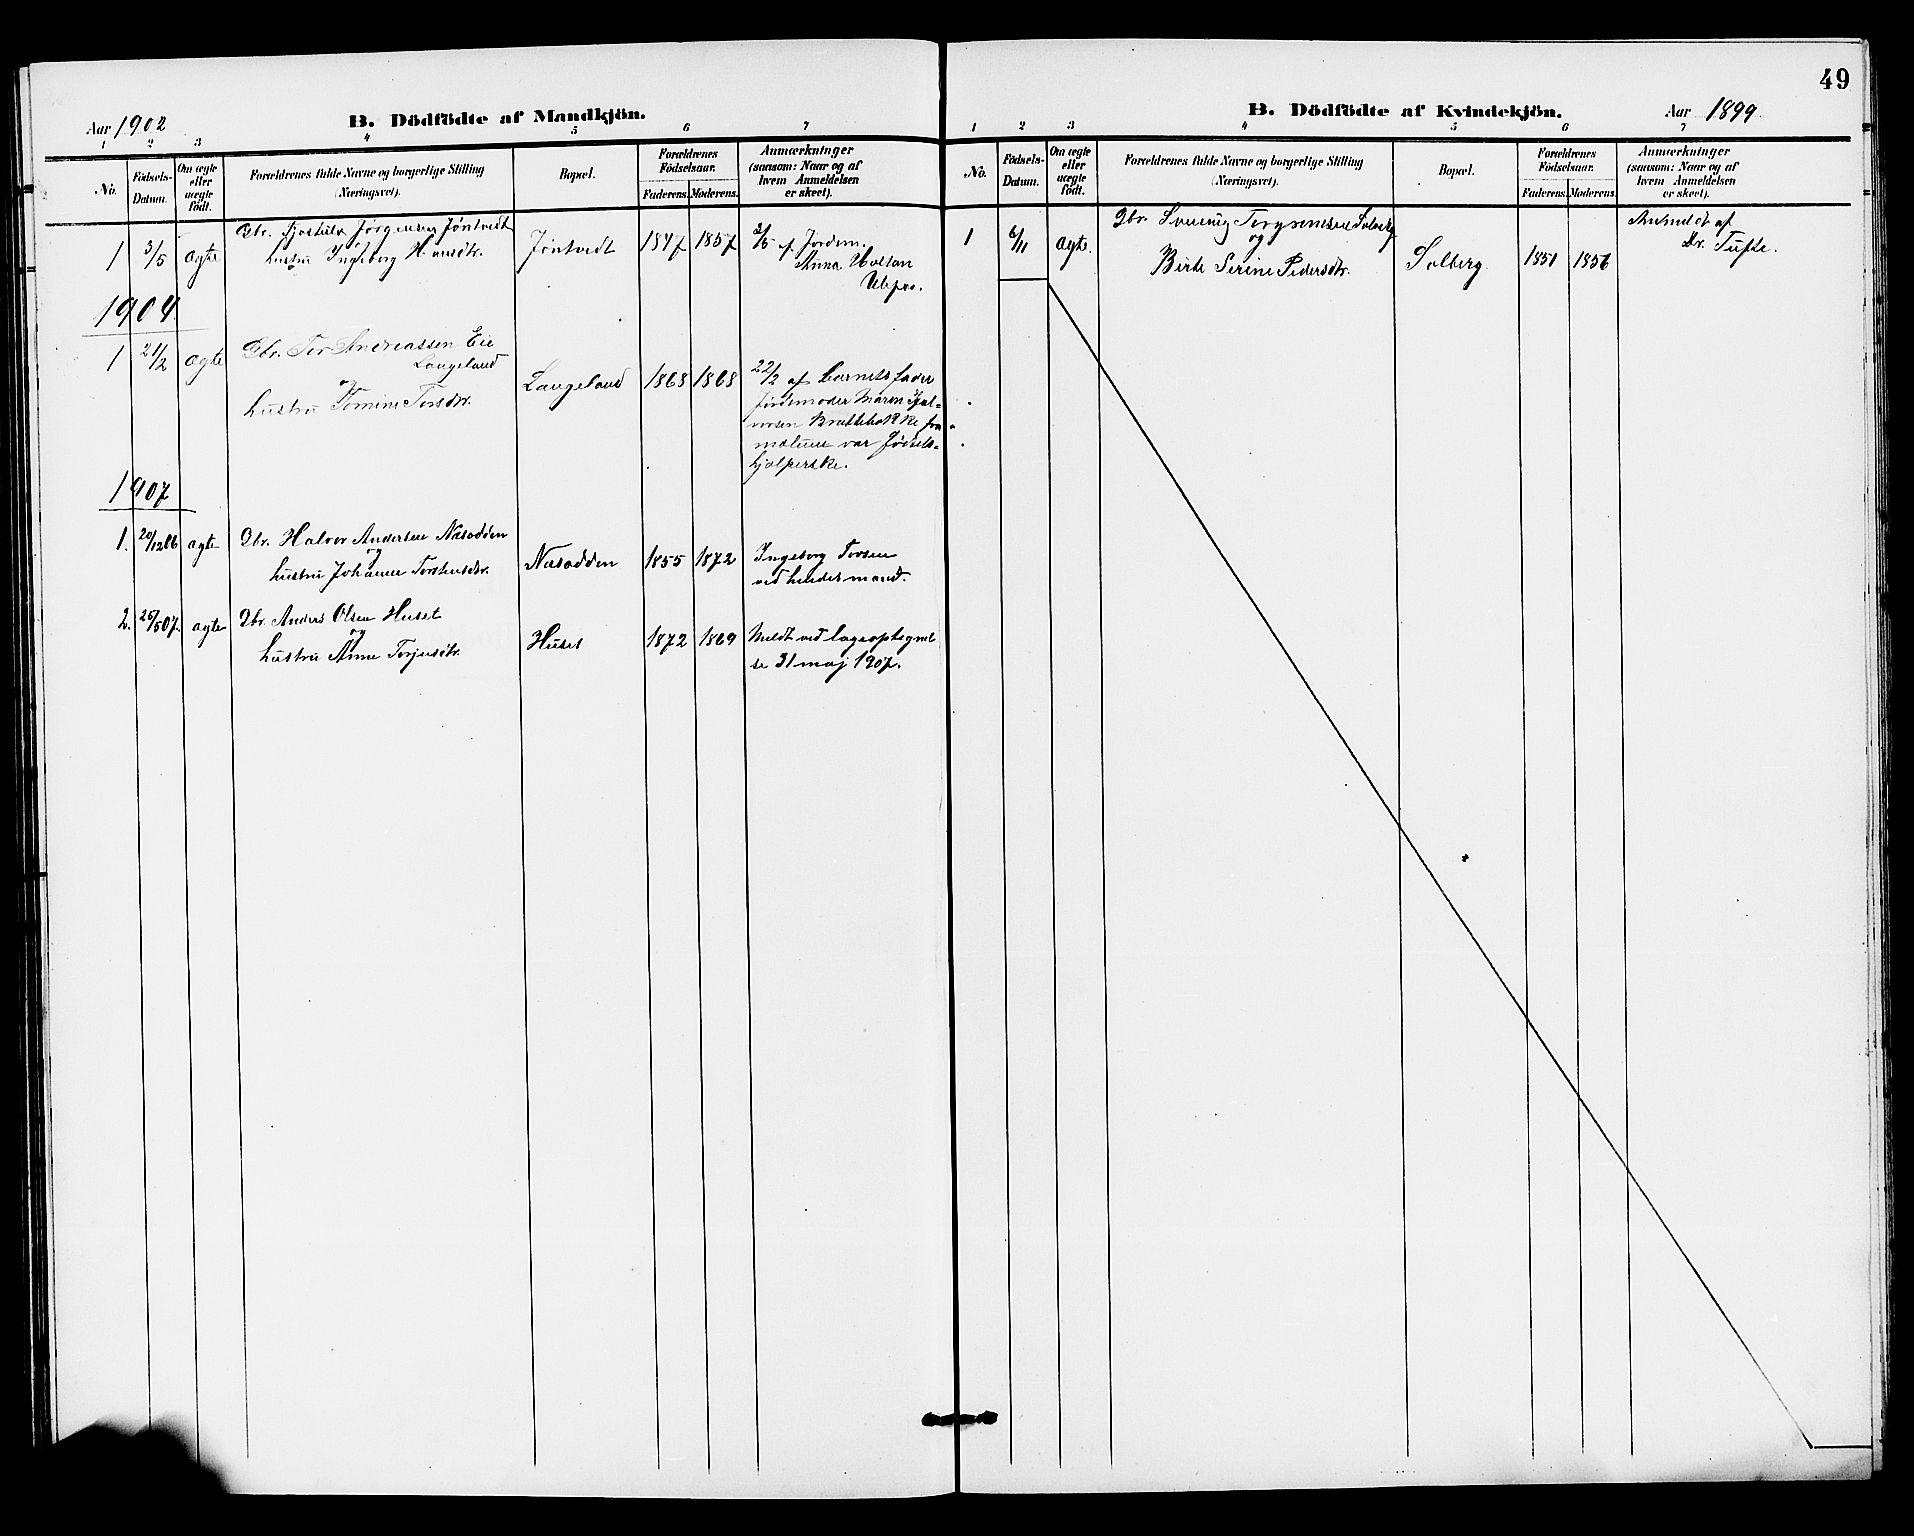 SAKO, Holla kirkebøker, G/Gb/L0002: Klokkerbok nr. II 2, 1897-1913, s. 49